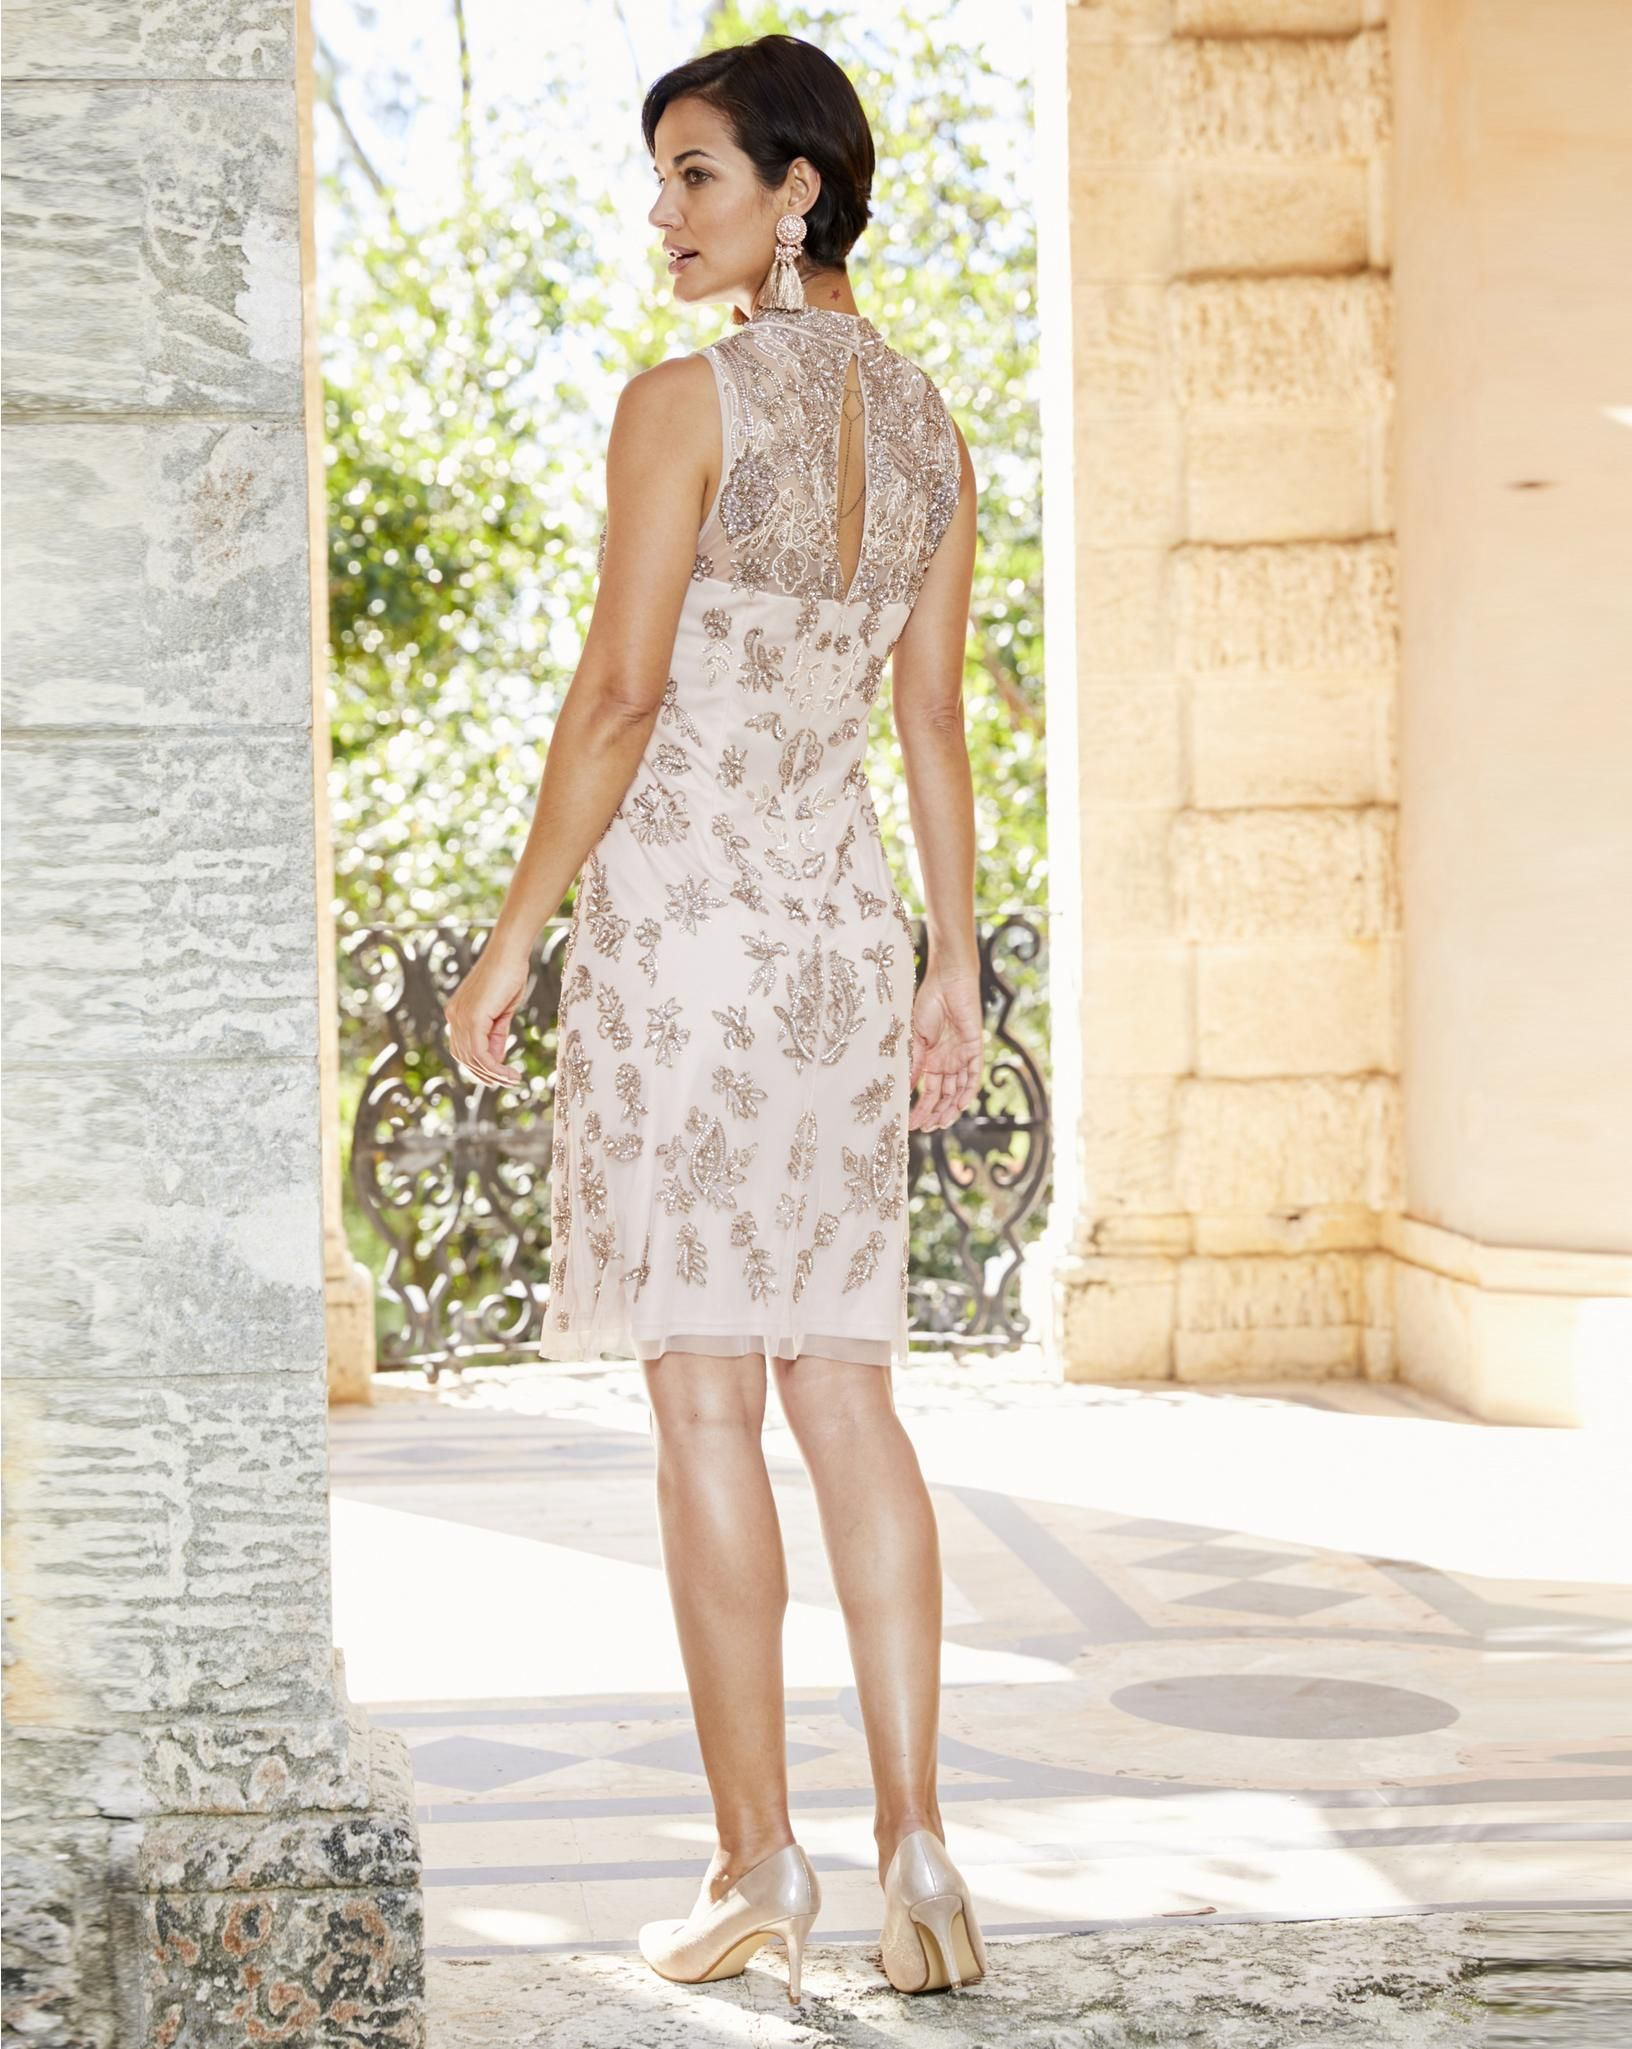 Beaded Shift Dress Jd Williams Usa Shift Dress Dresses Mother Of The Bride Dresses [ 2049 x 1632 Pixel ]